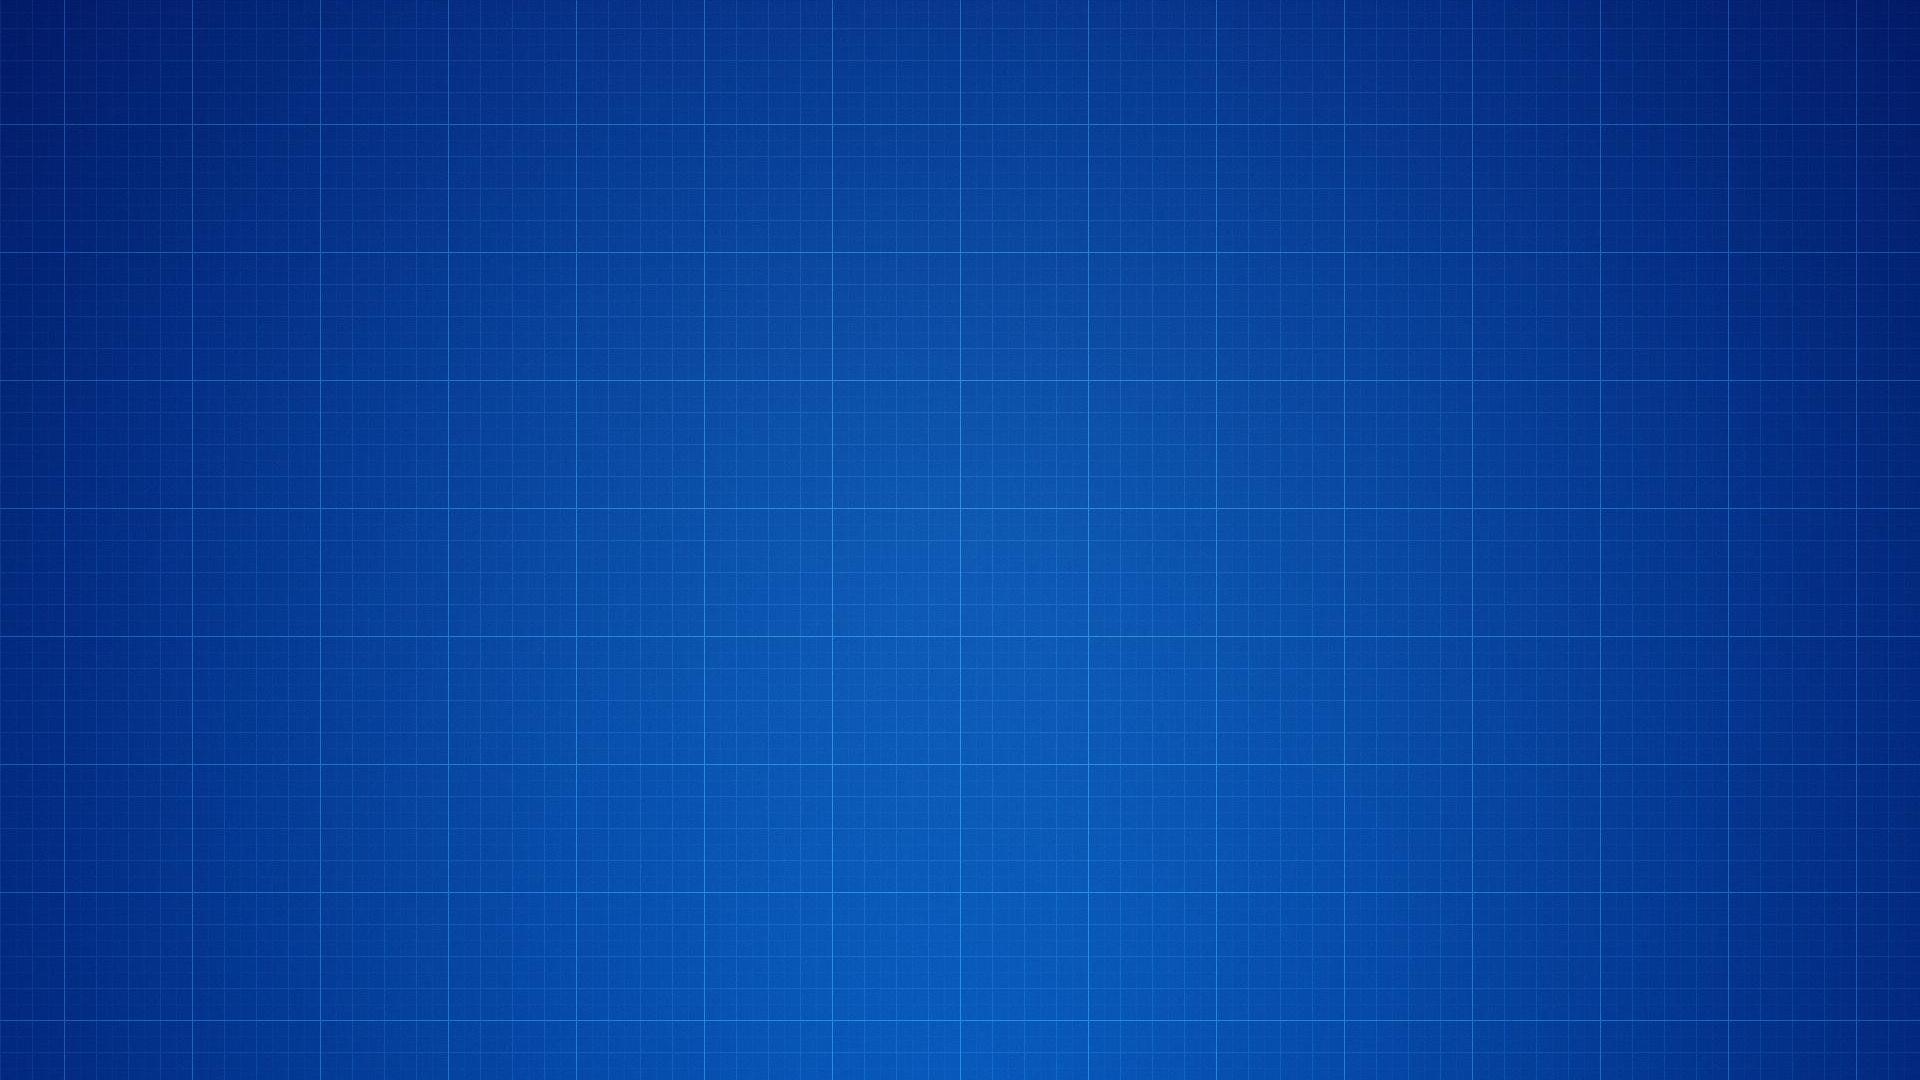 1920x1080px blueprint background wallpaper wallpapersafari blueprint wallpaper 79849 1920x1080 malvernweather Image collections